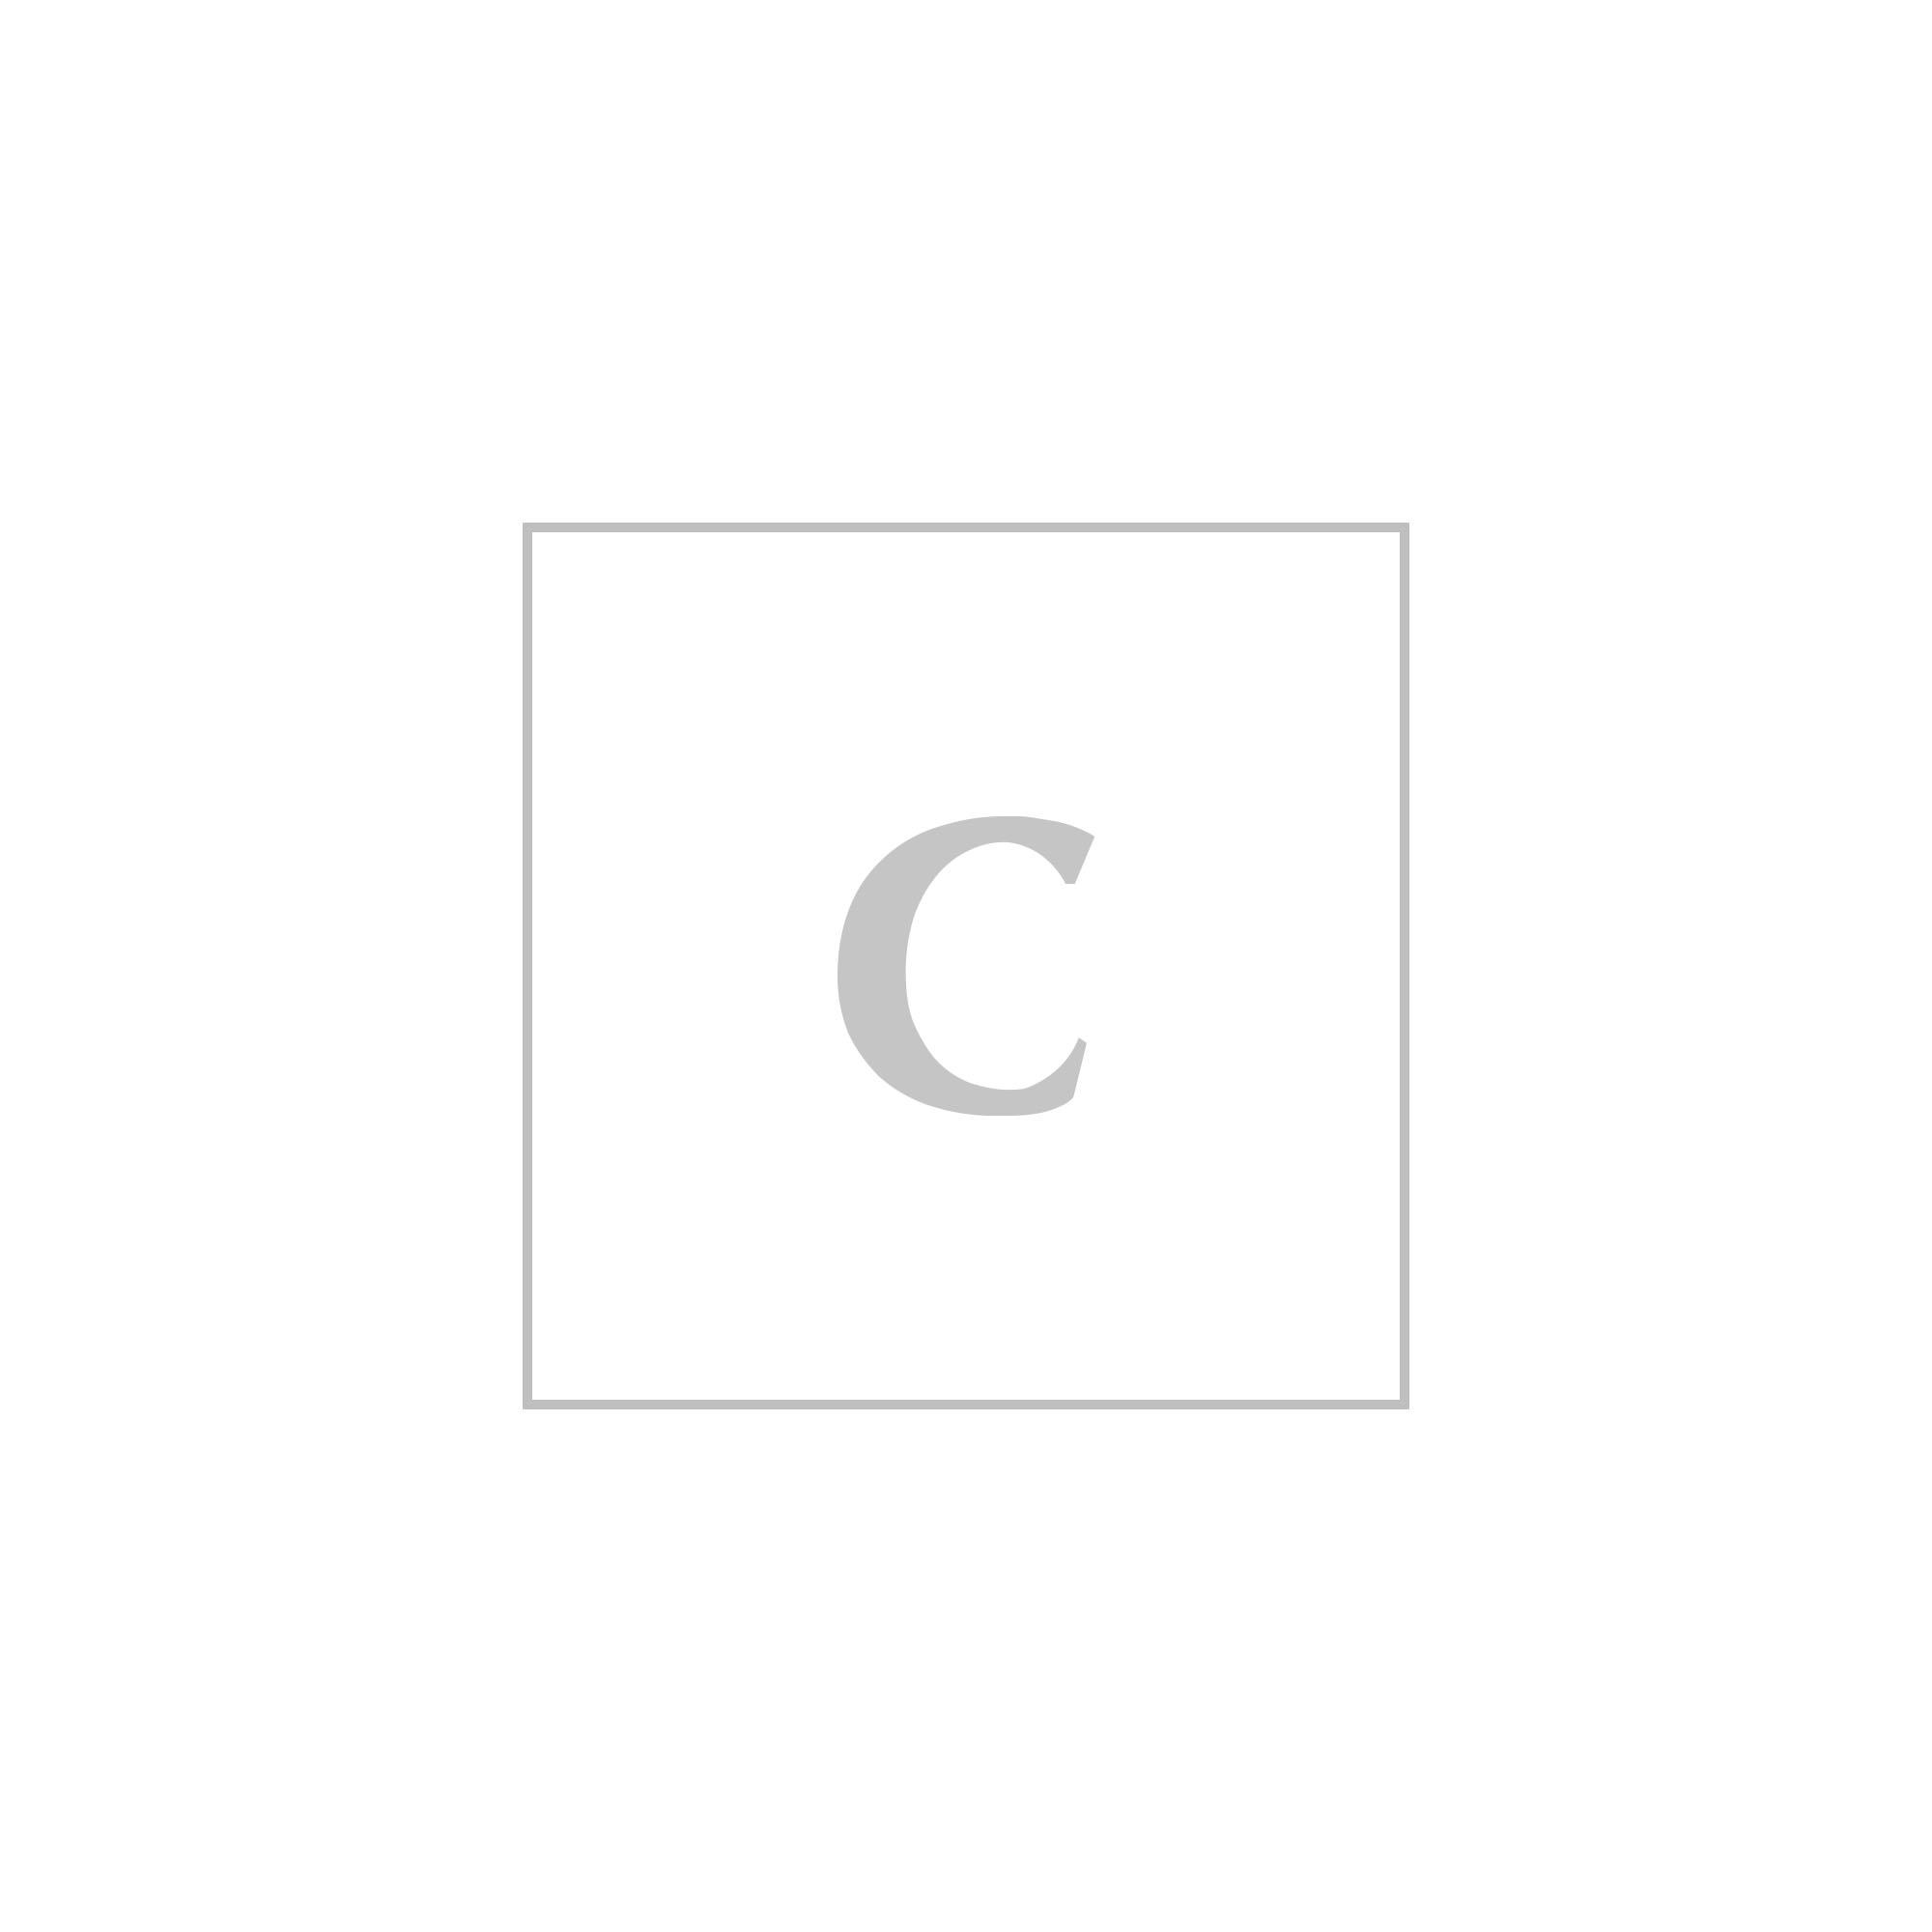 https://www.coltortiboutique.com/media/catalog/product/cache/926507dc7f93631a094422215b778fe0/s/k/skirts_miu-miu_blu_192151dgn000002-f0013-3.jpg